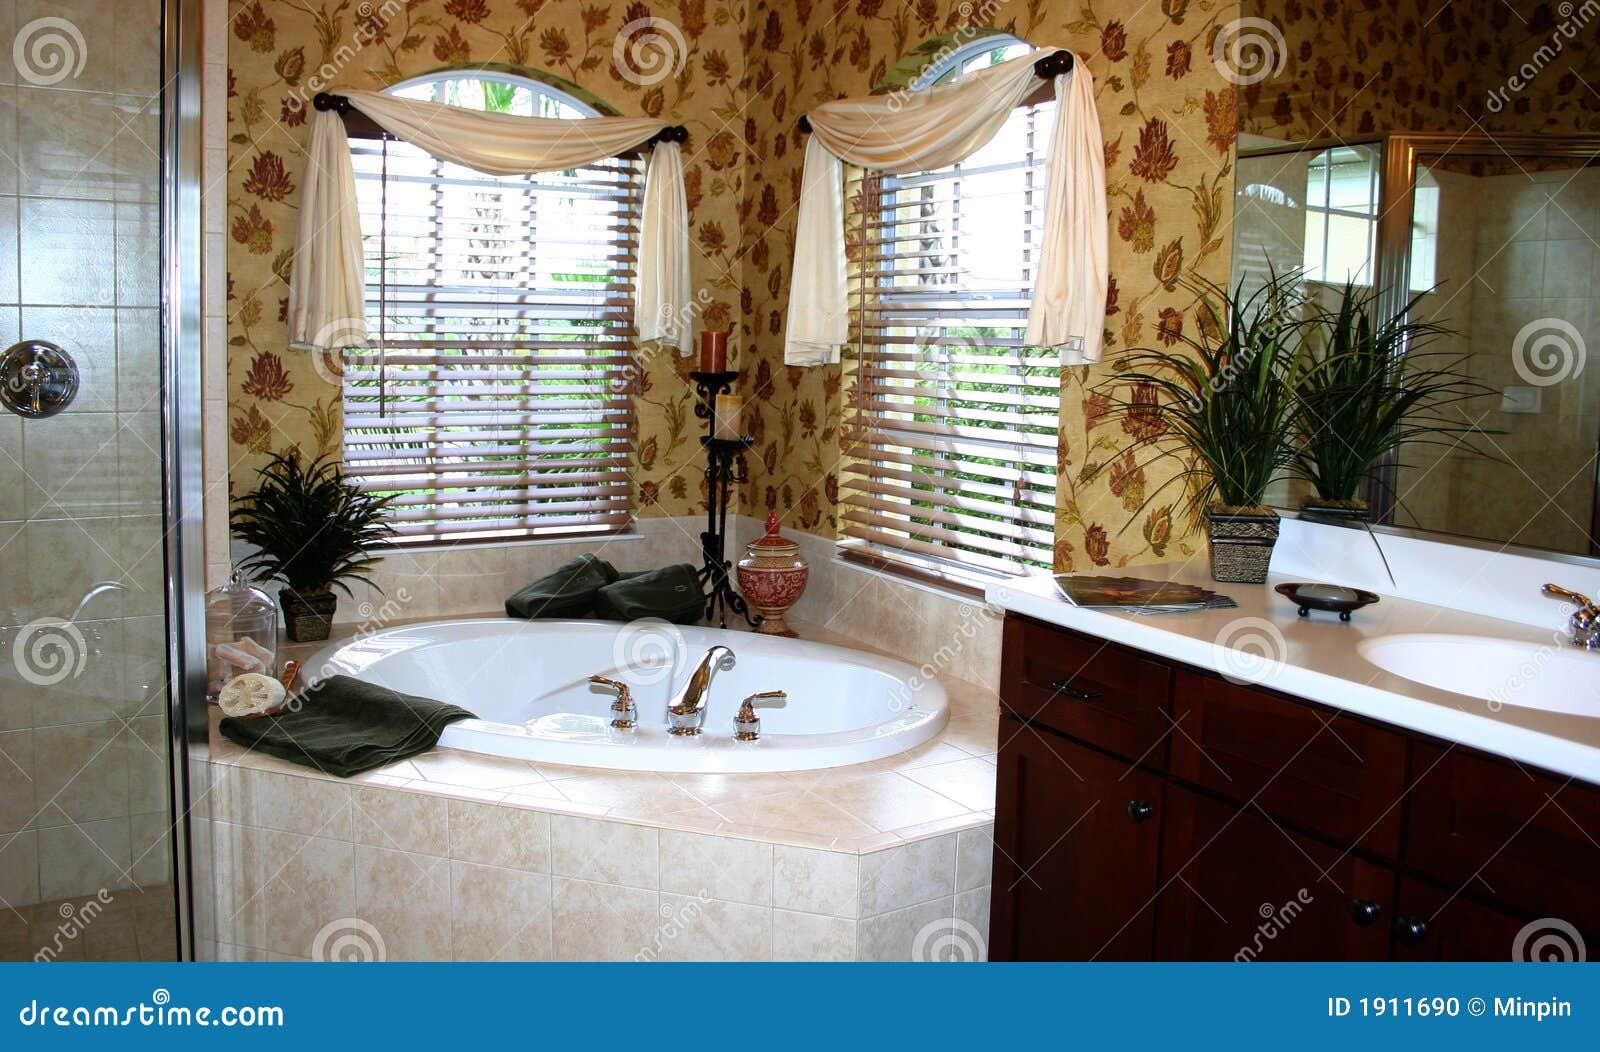 banheiro de canto bonito com cuba de Jacuzzi papel de parede floral  #674420 1300x872 Banheiro De Pobre Bonito